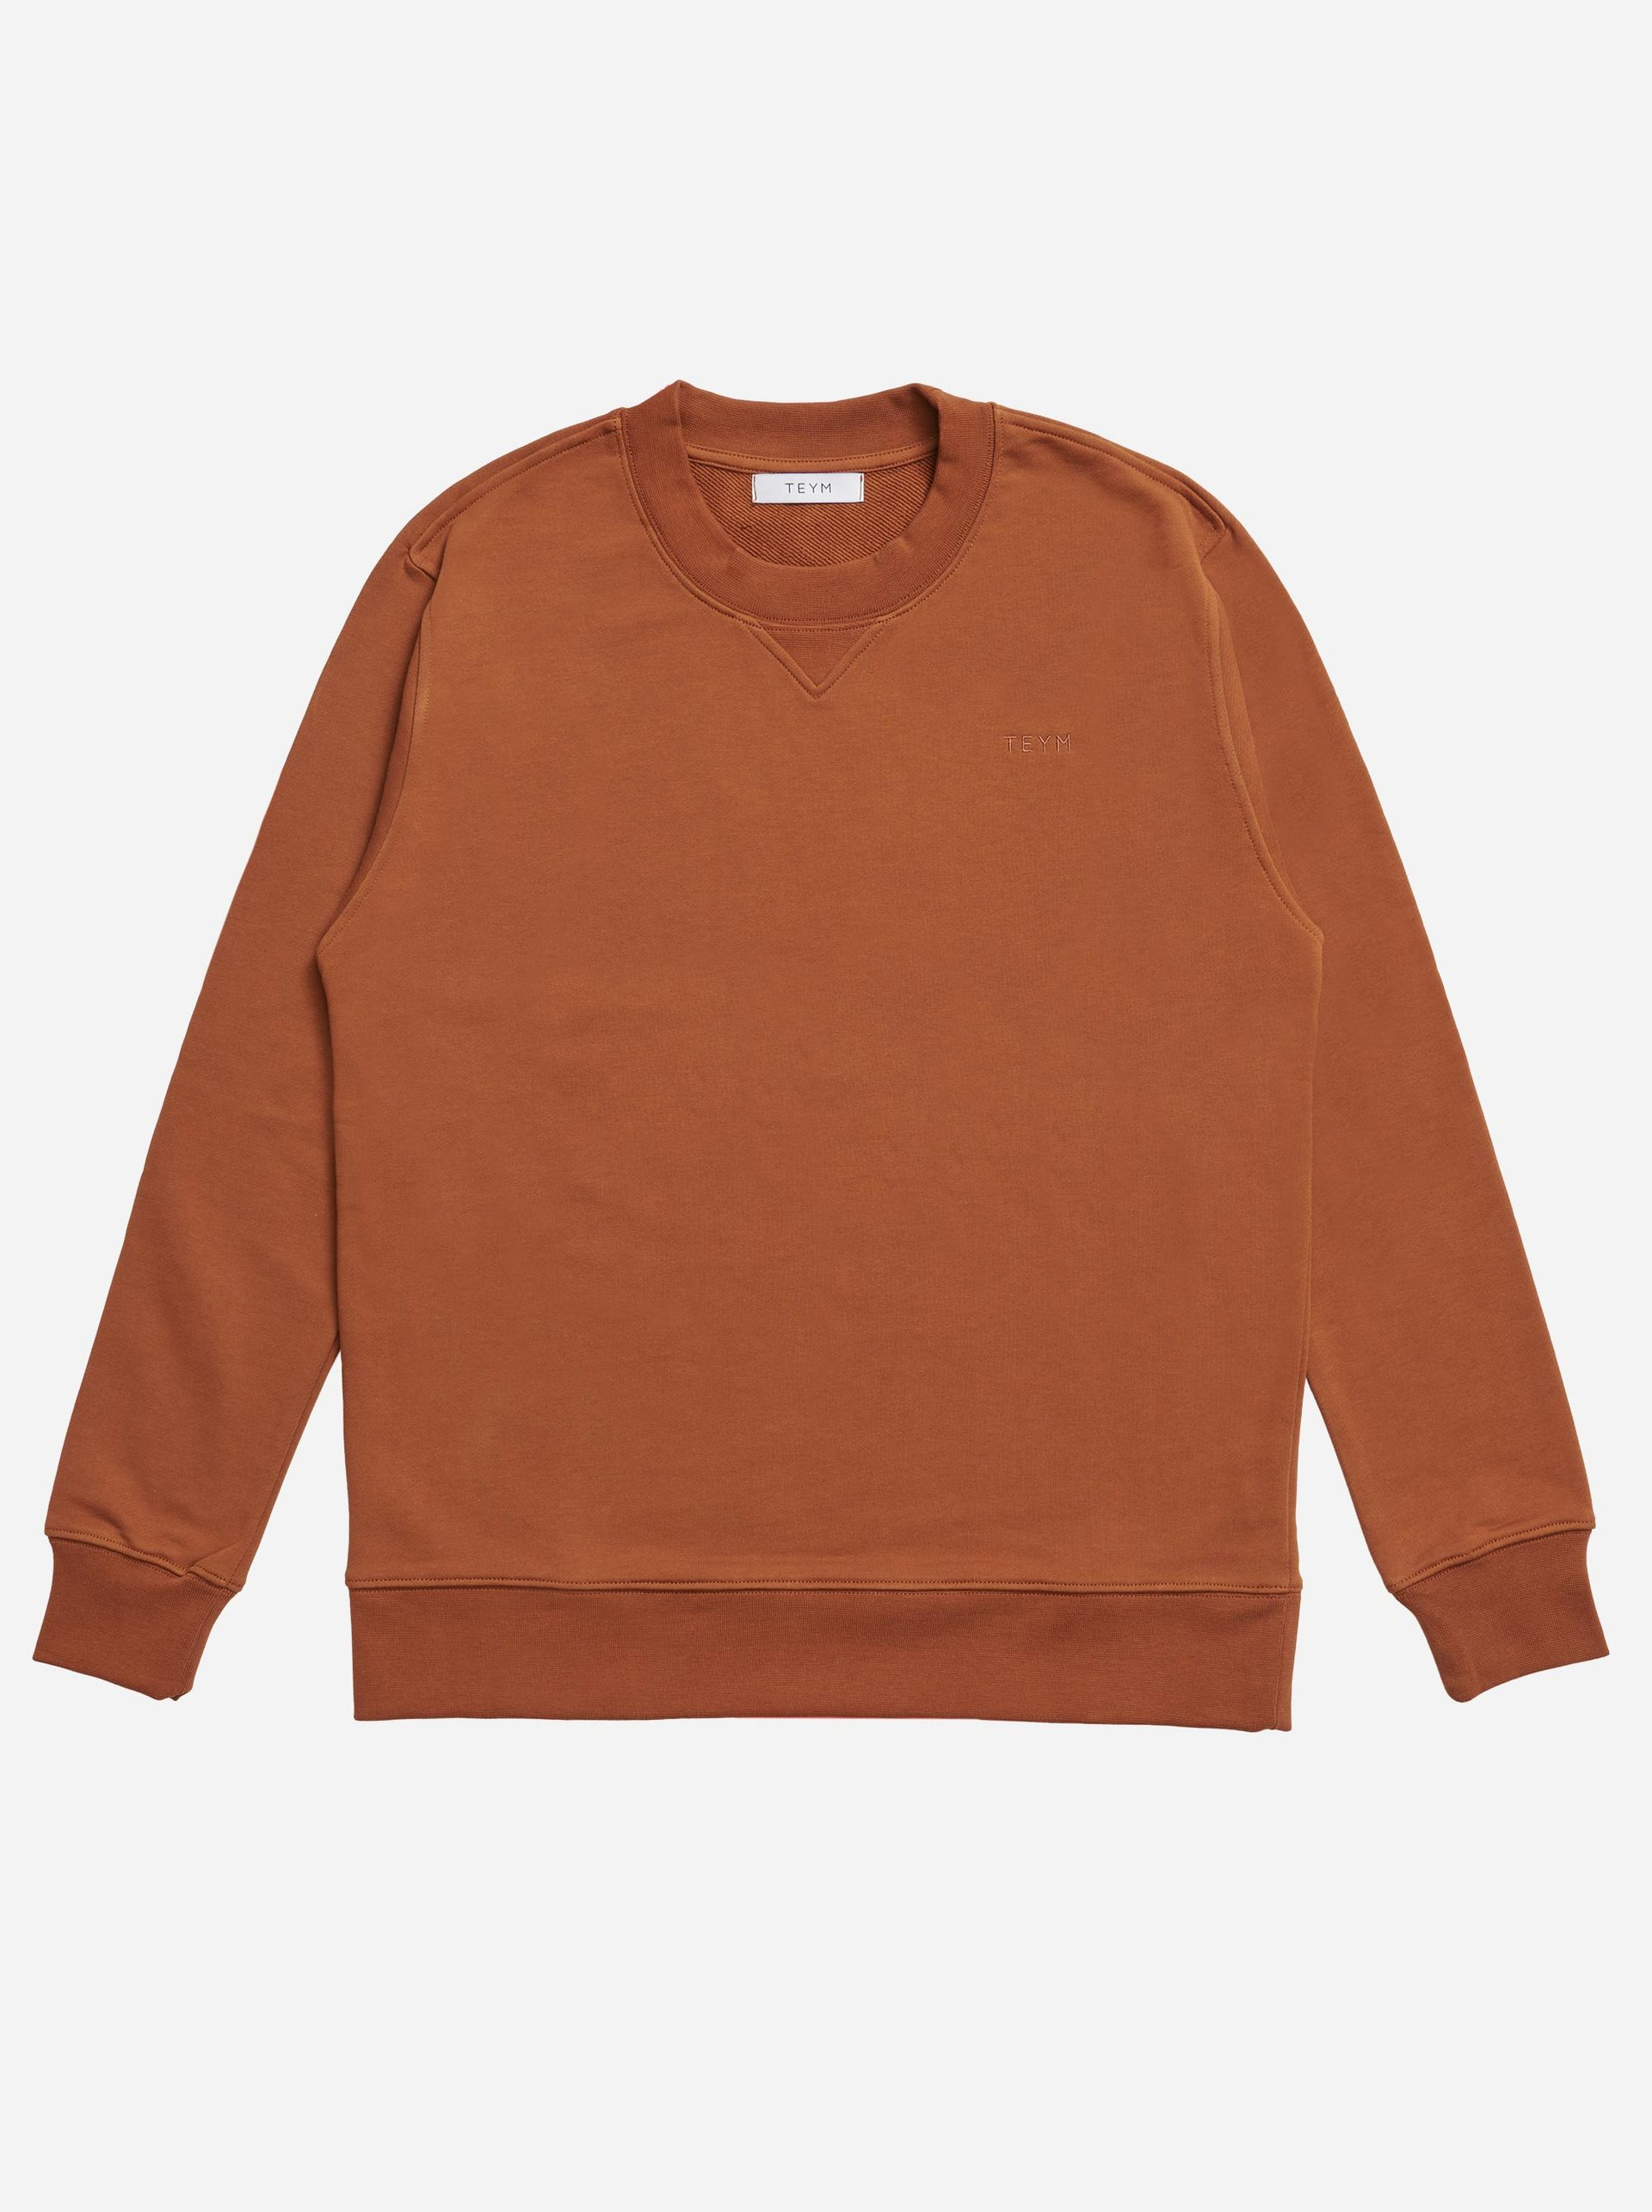 Teym-TheSweatshirt-Men-Camel04